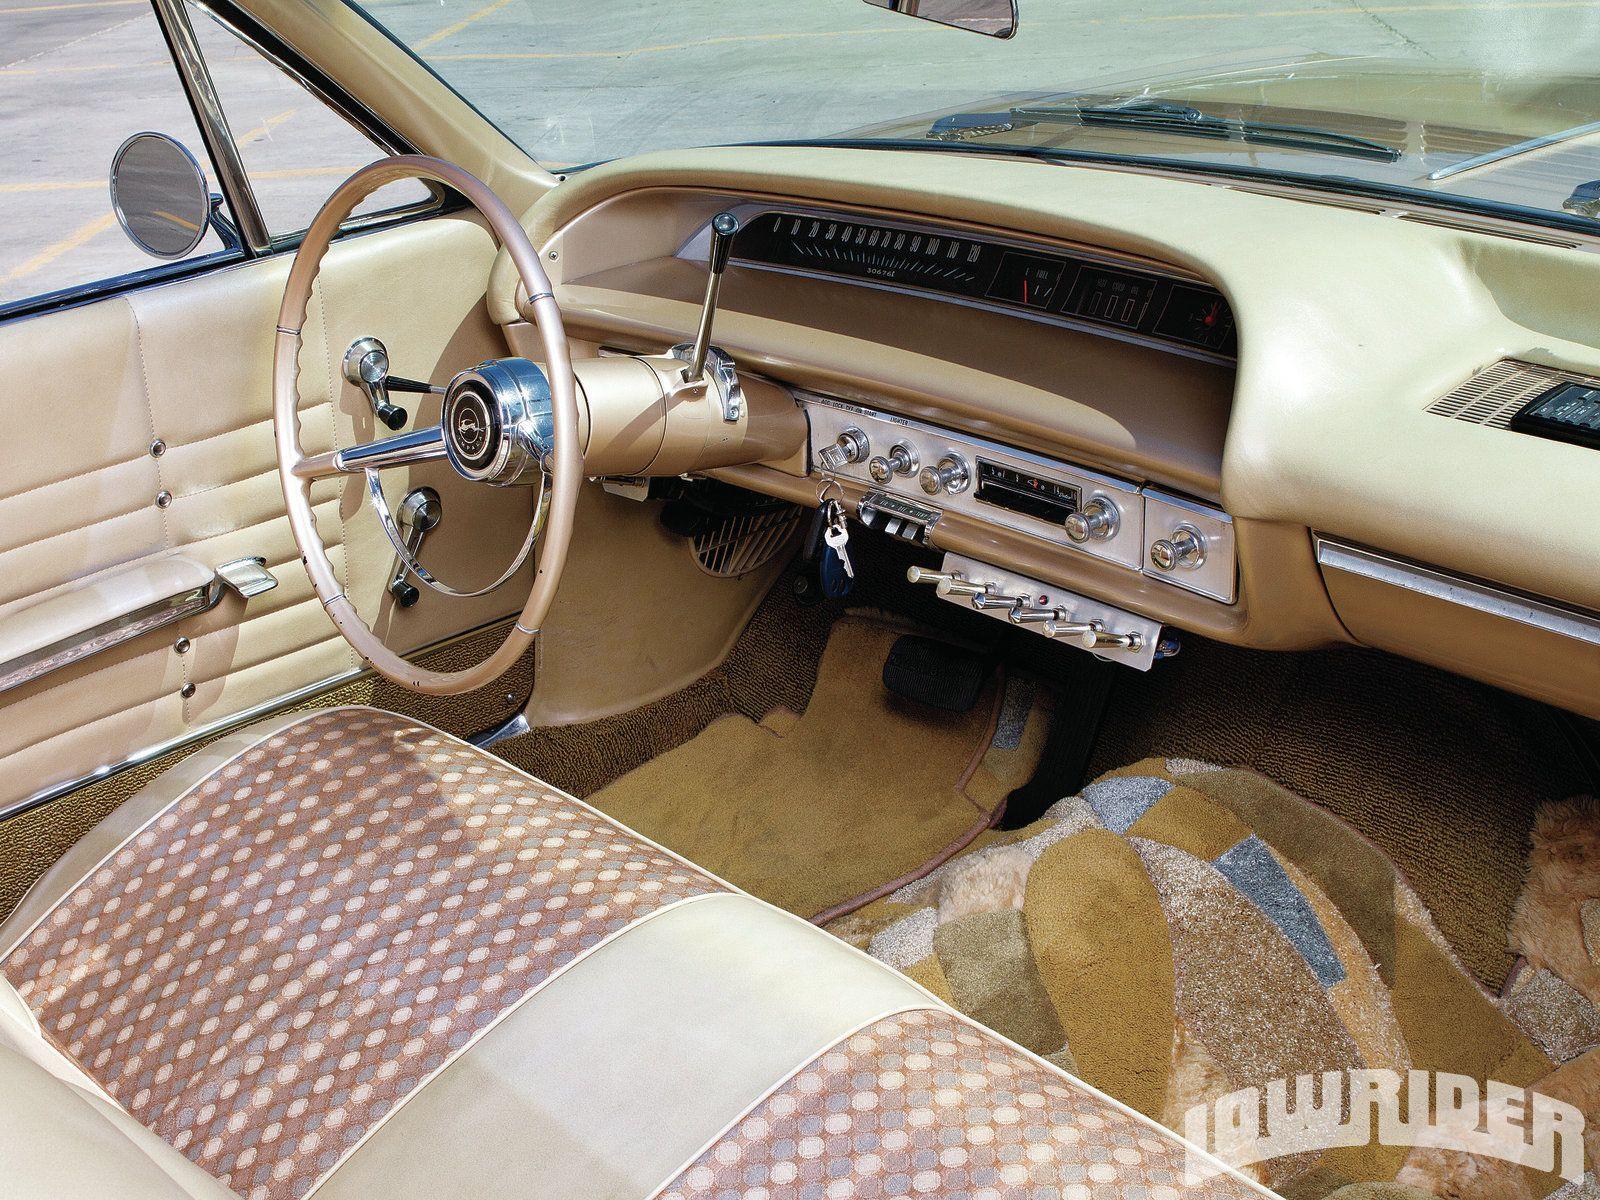 1964 Chevrolet Impala Lowrider Interior Chevrolet Impala Lowriders Impala